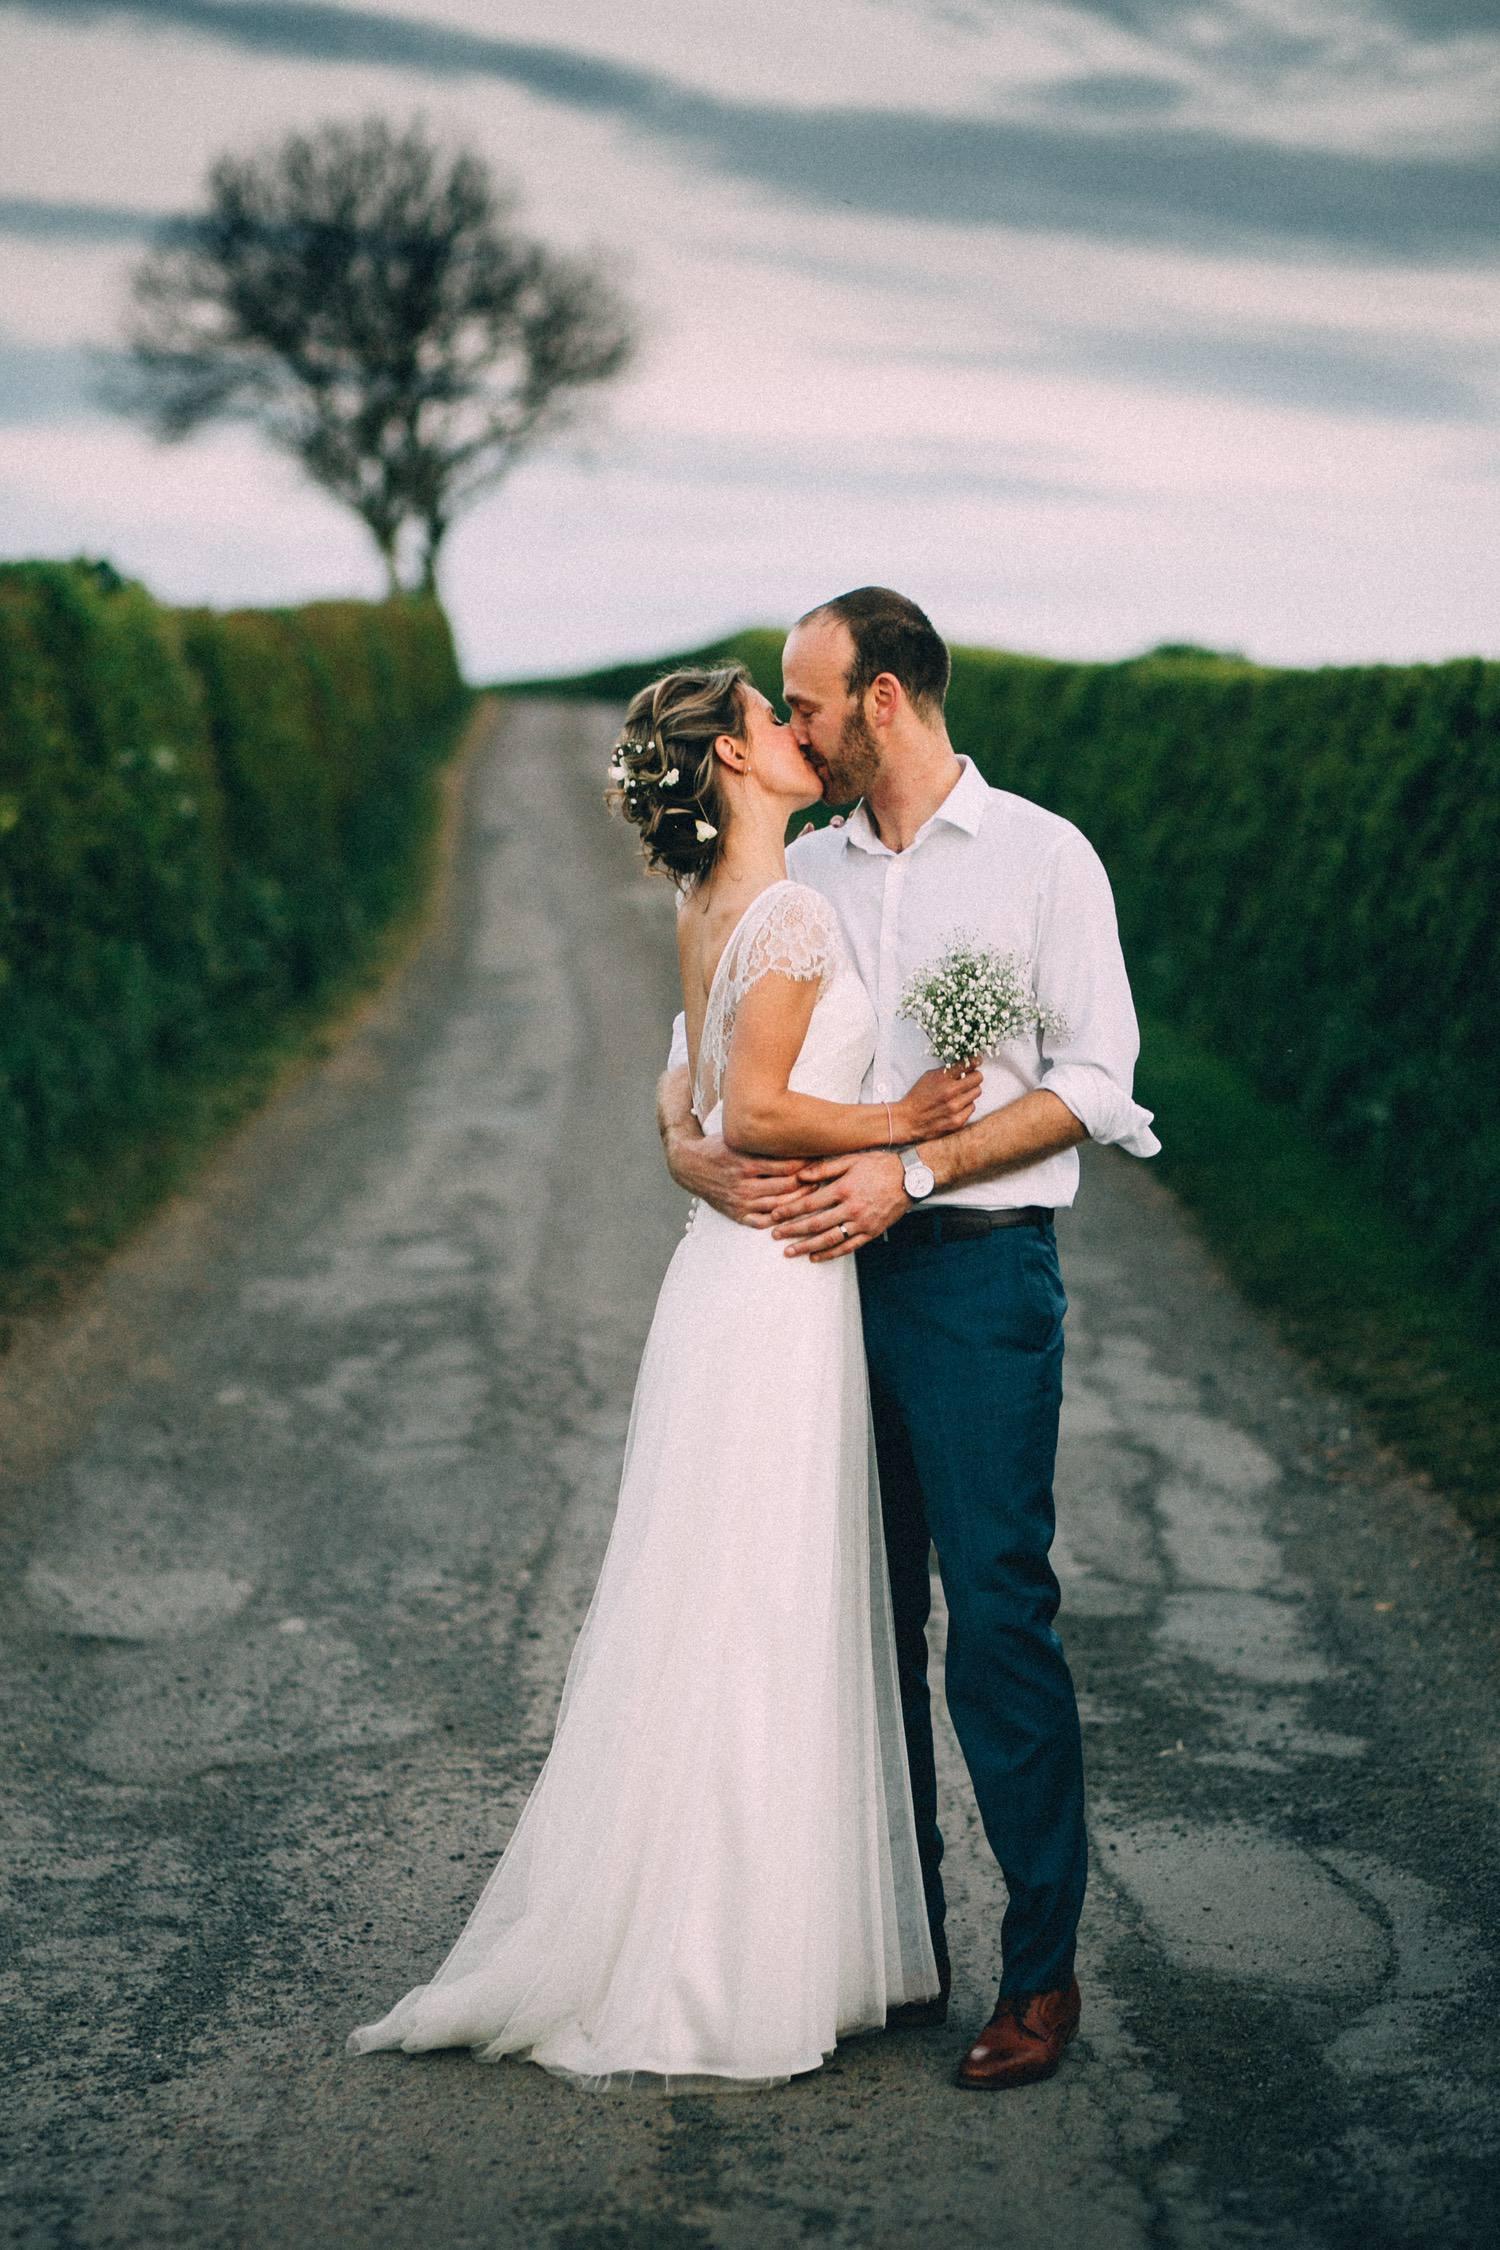 Brinkburn-Priory-Wedding-Photos-73.jpg